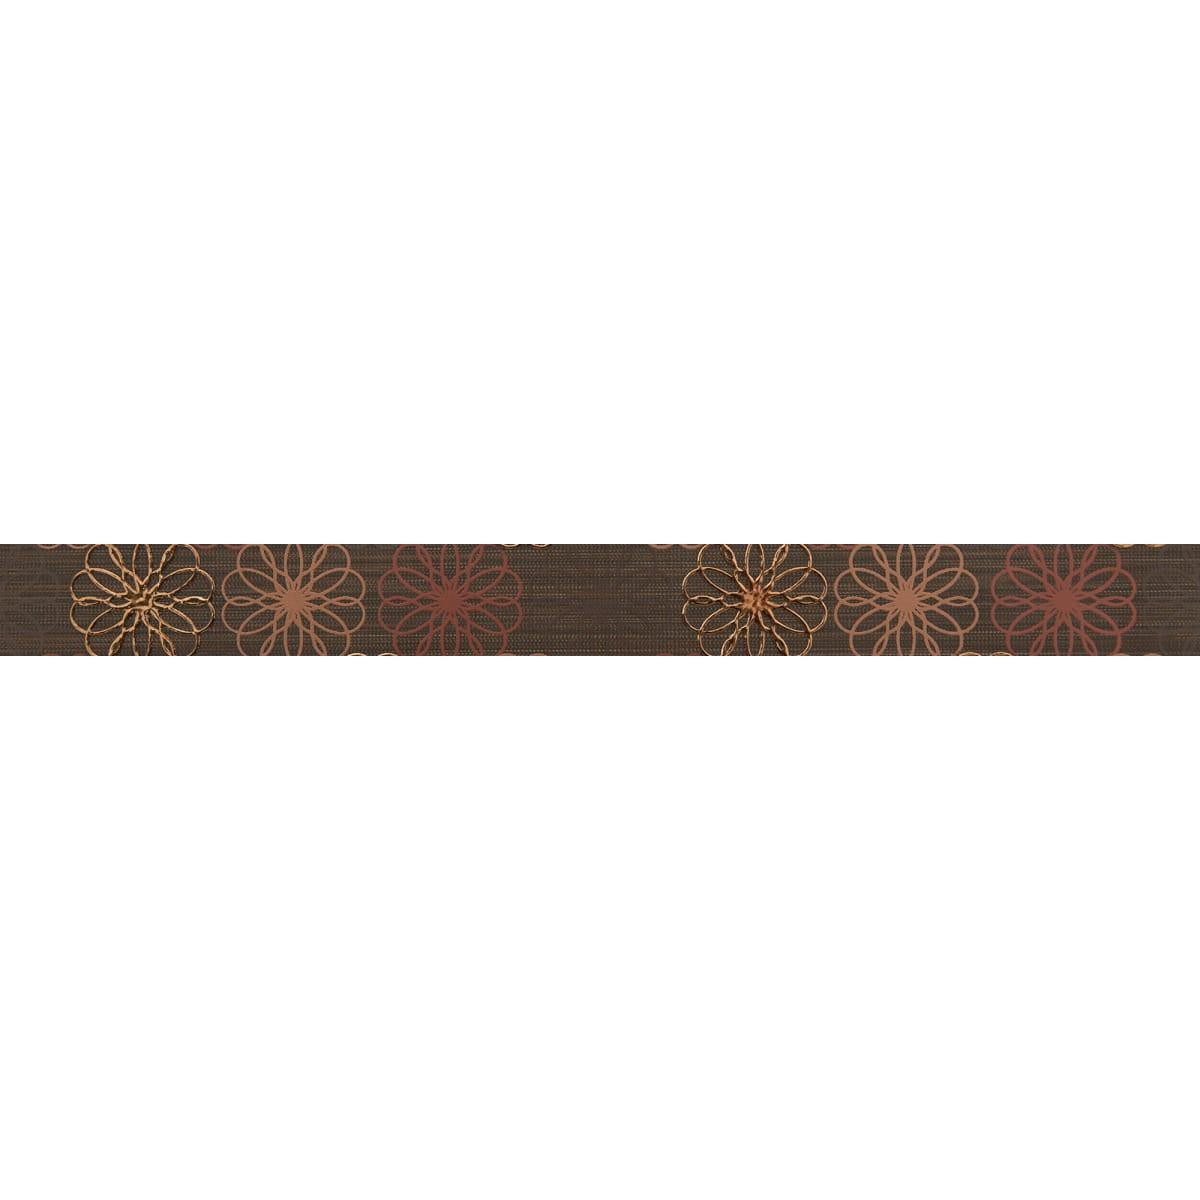 Бордюр «Дария 4» 50х4.7 см, цвет коричневый